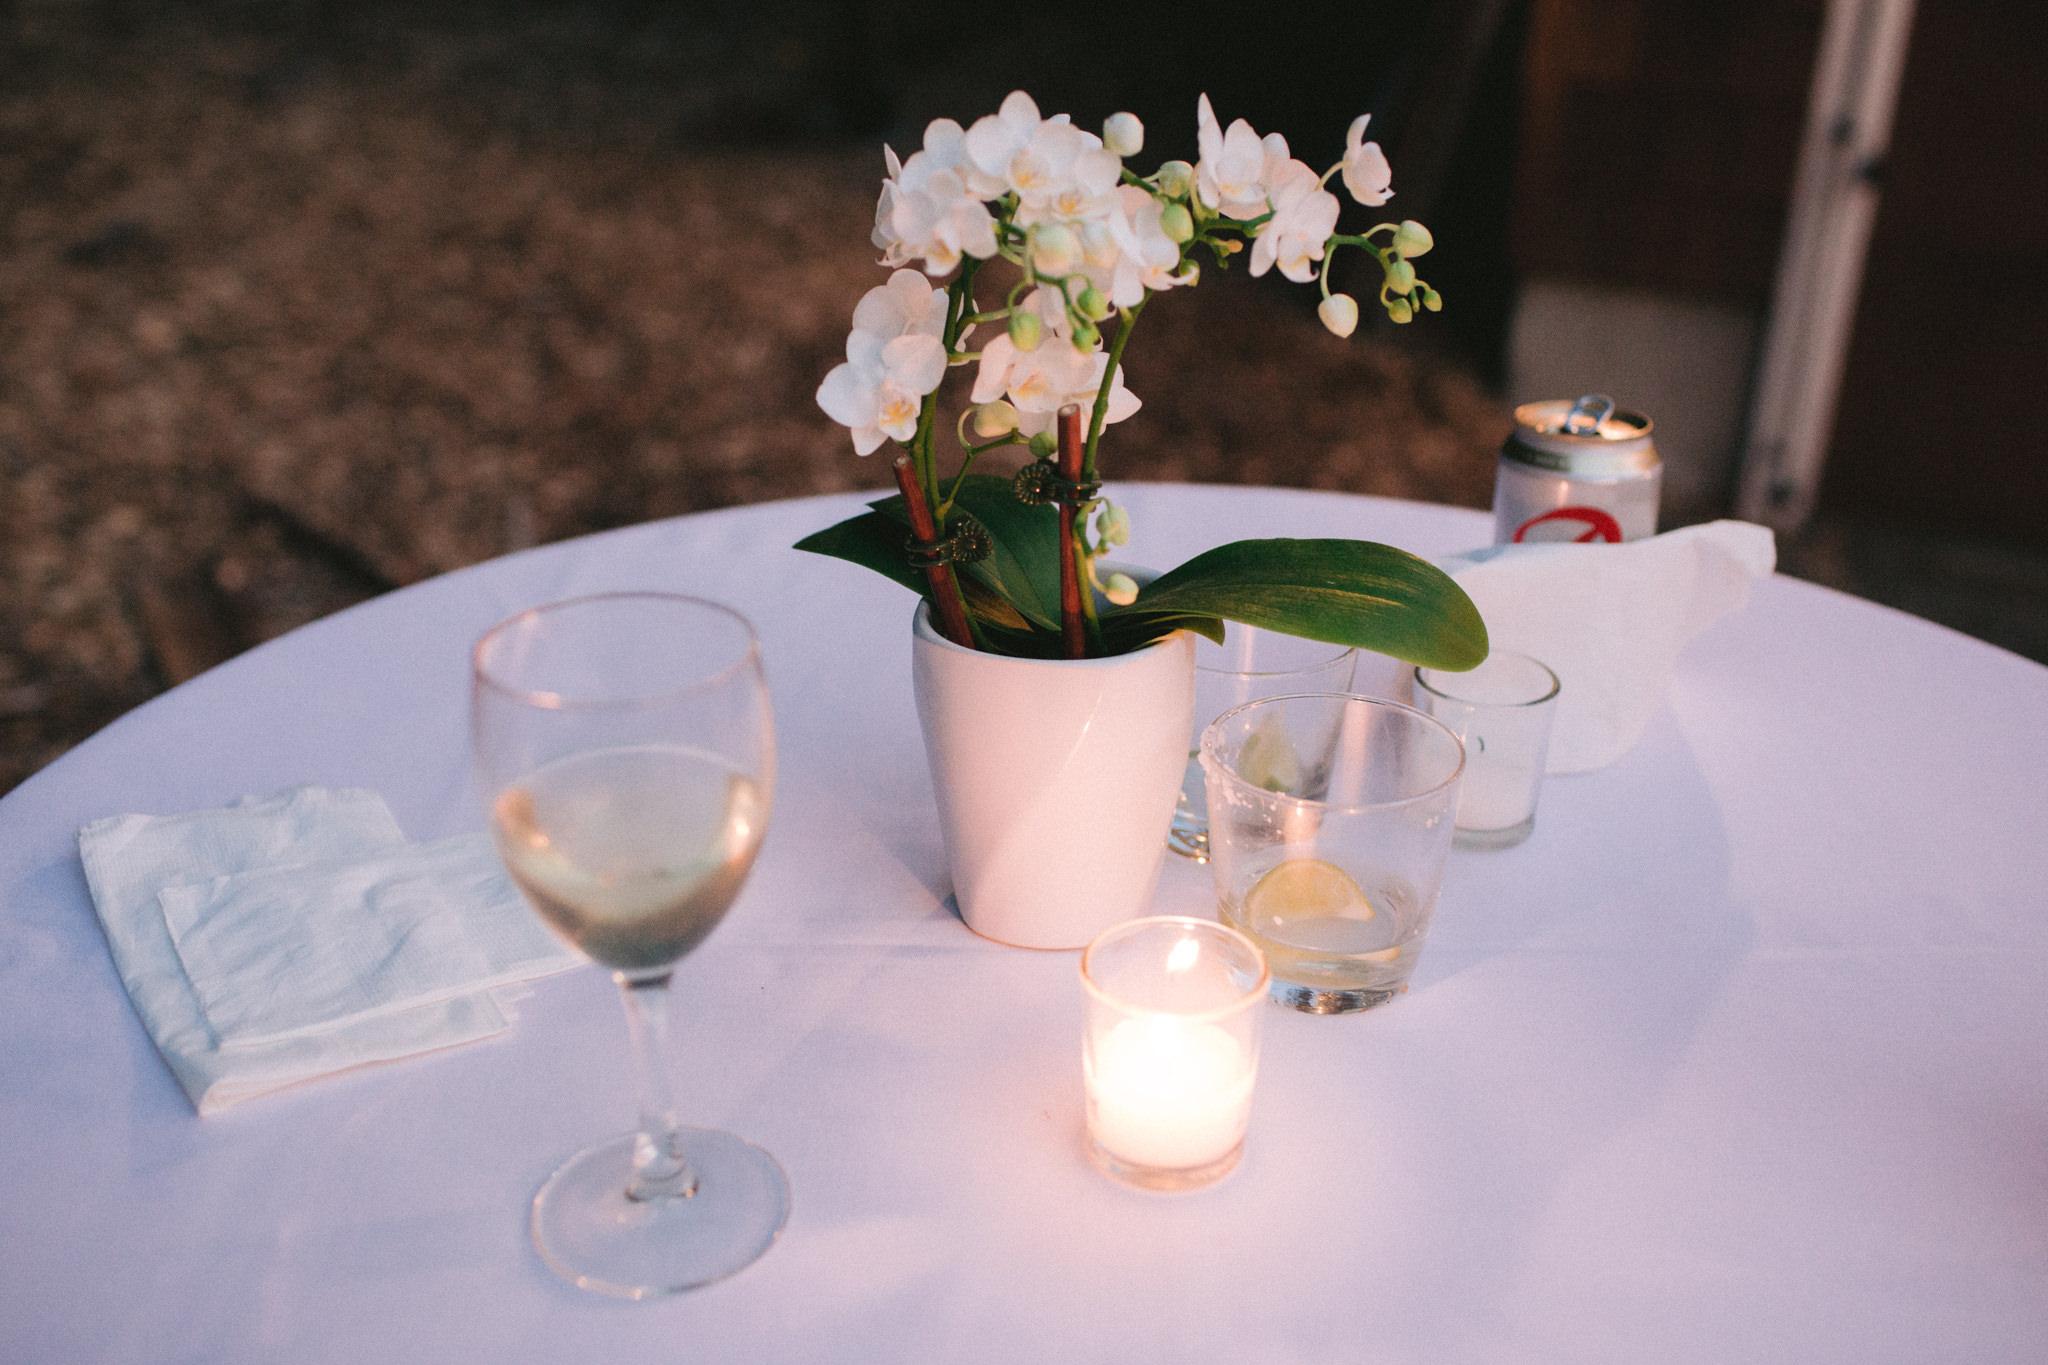 Backyard-Bainbridge-Island-Wedding-Alycia-Lovell-Photography-249.JPG